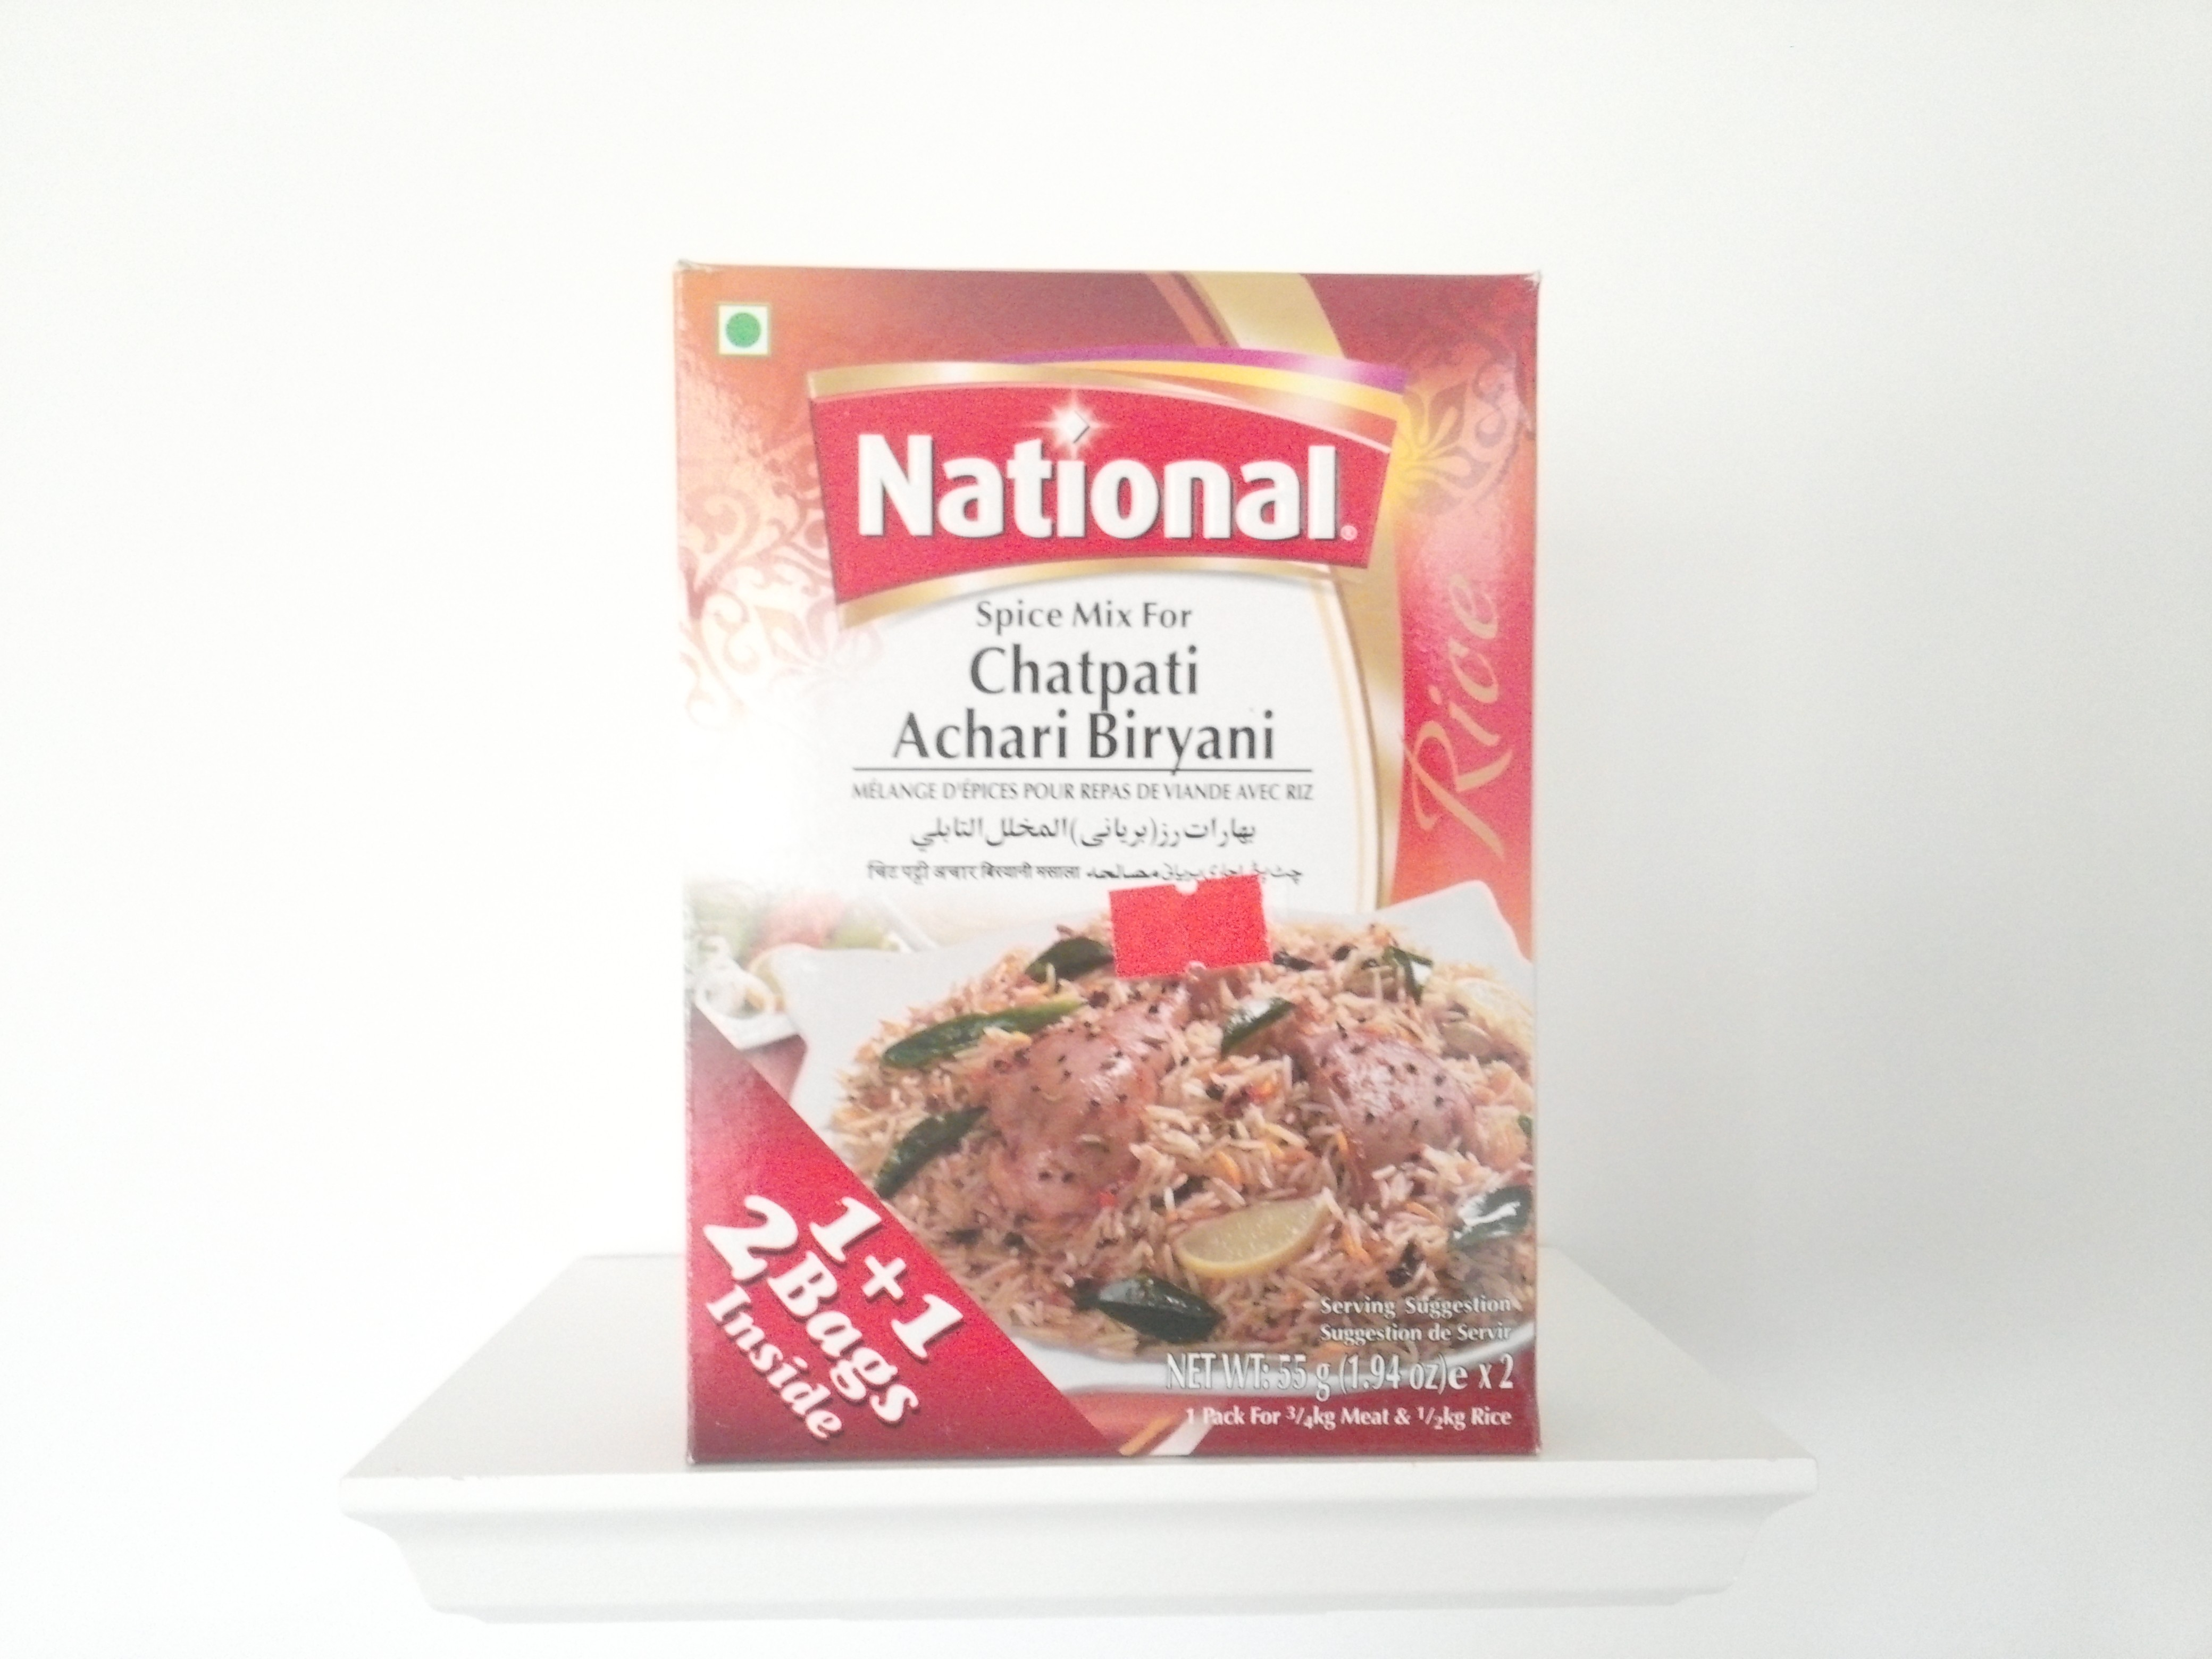 National Chatpati Achari Biryani Spice Mix 110 grm